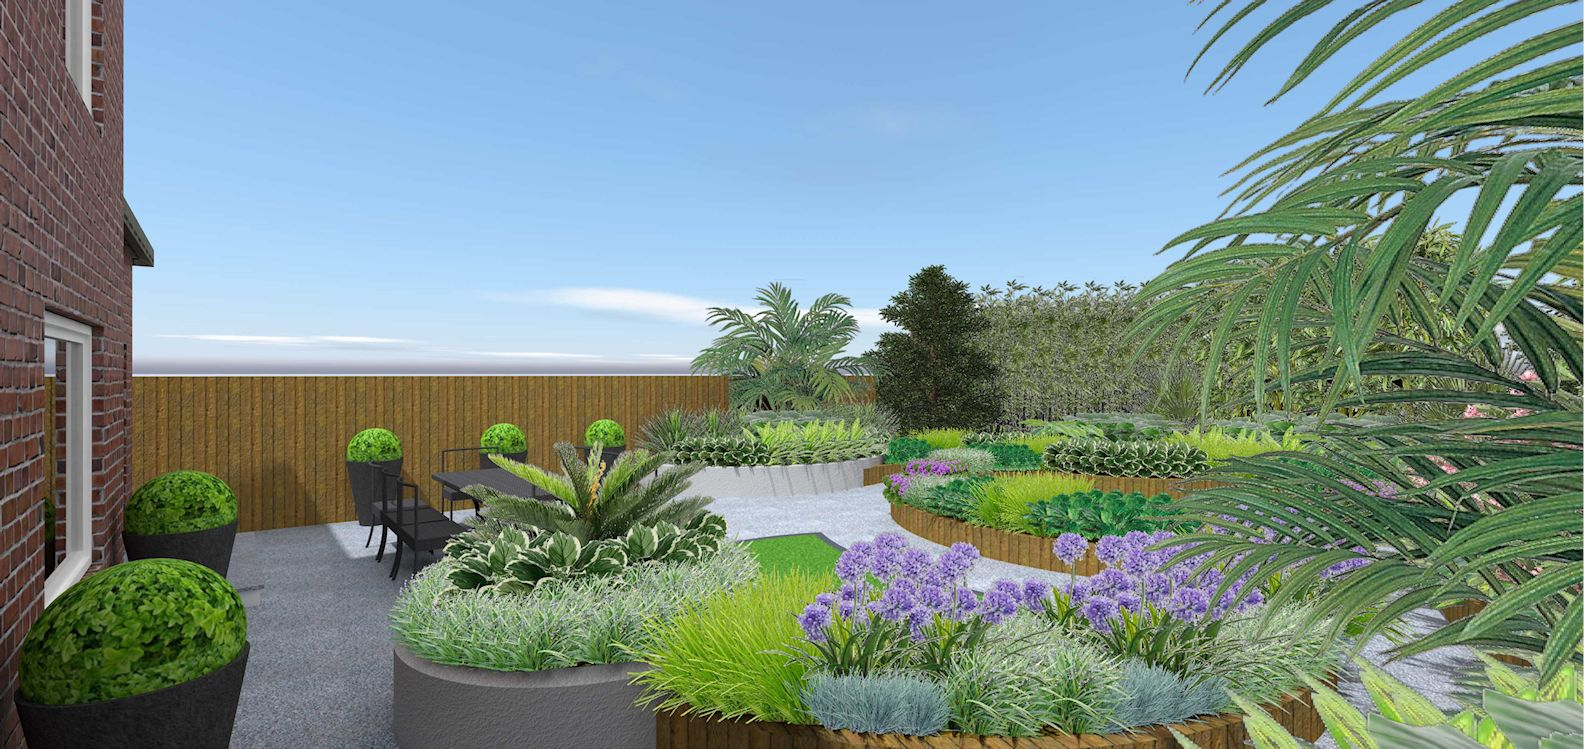 A life designing small garden design ascot berkshire for Garden design visualiser